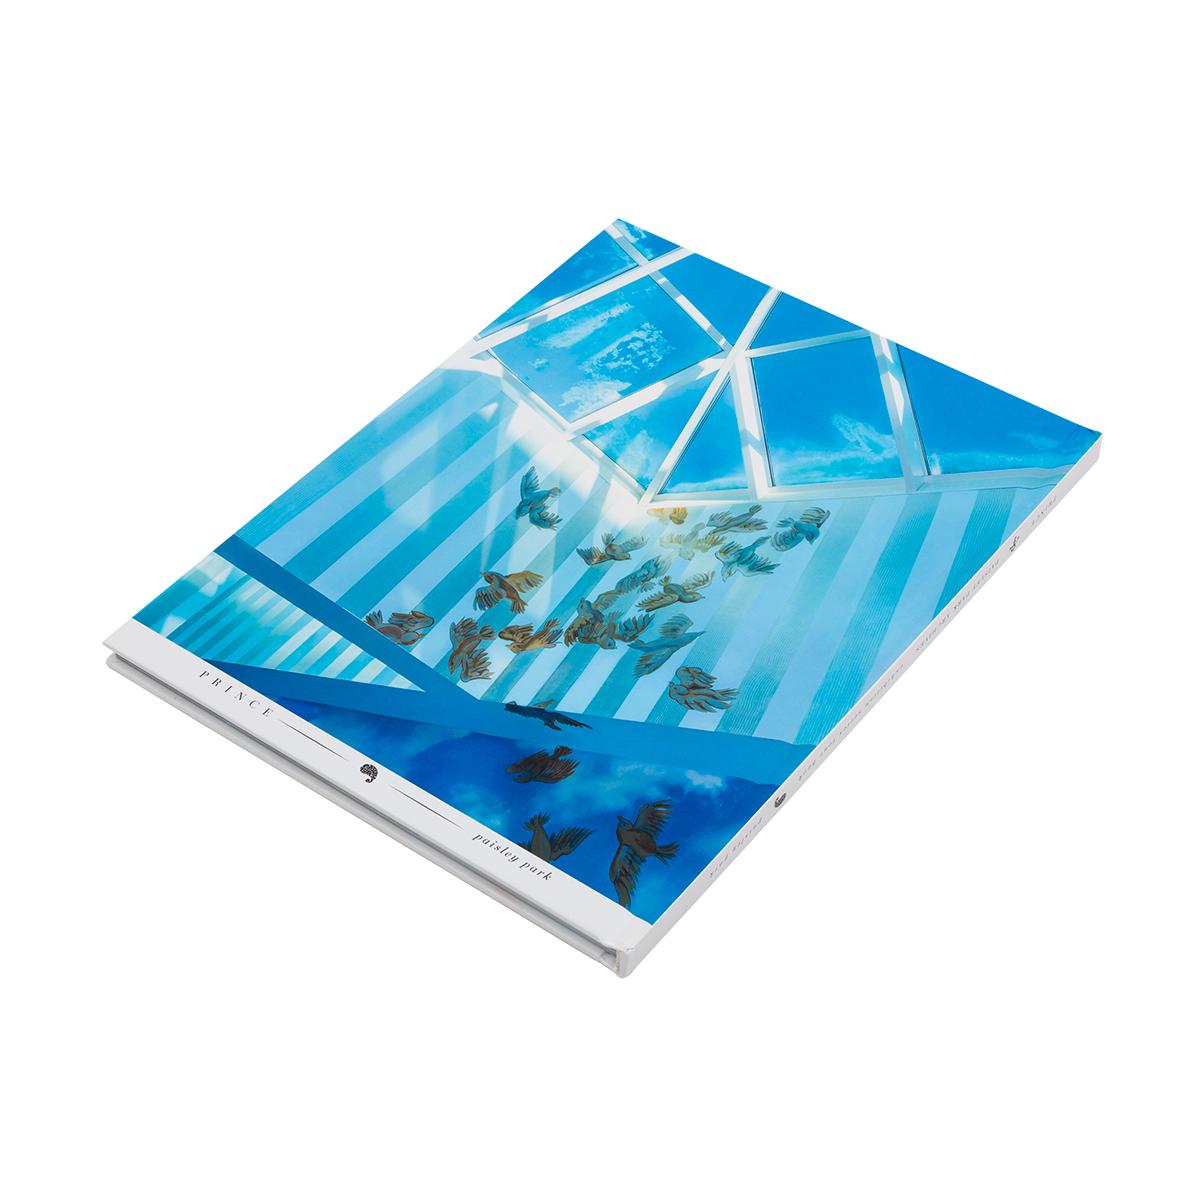 Paisley Park Exhibition Series - Paisley Park Edition